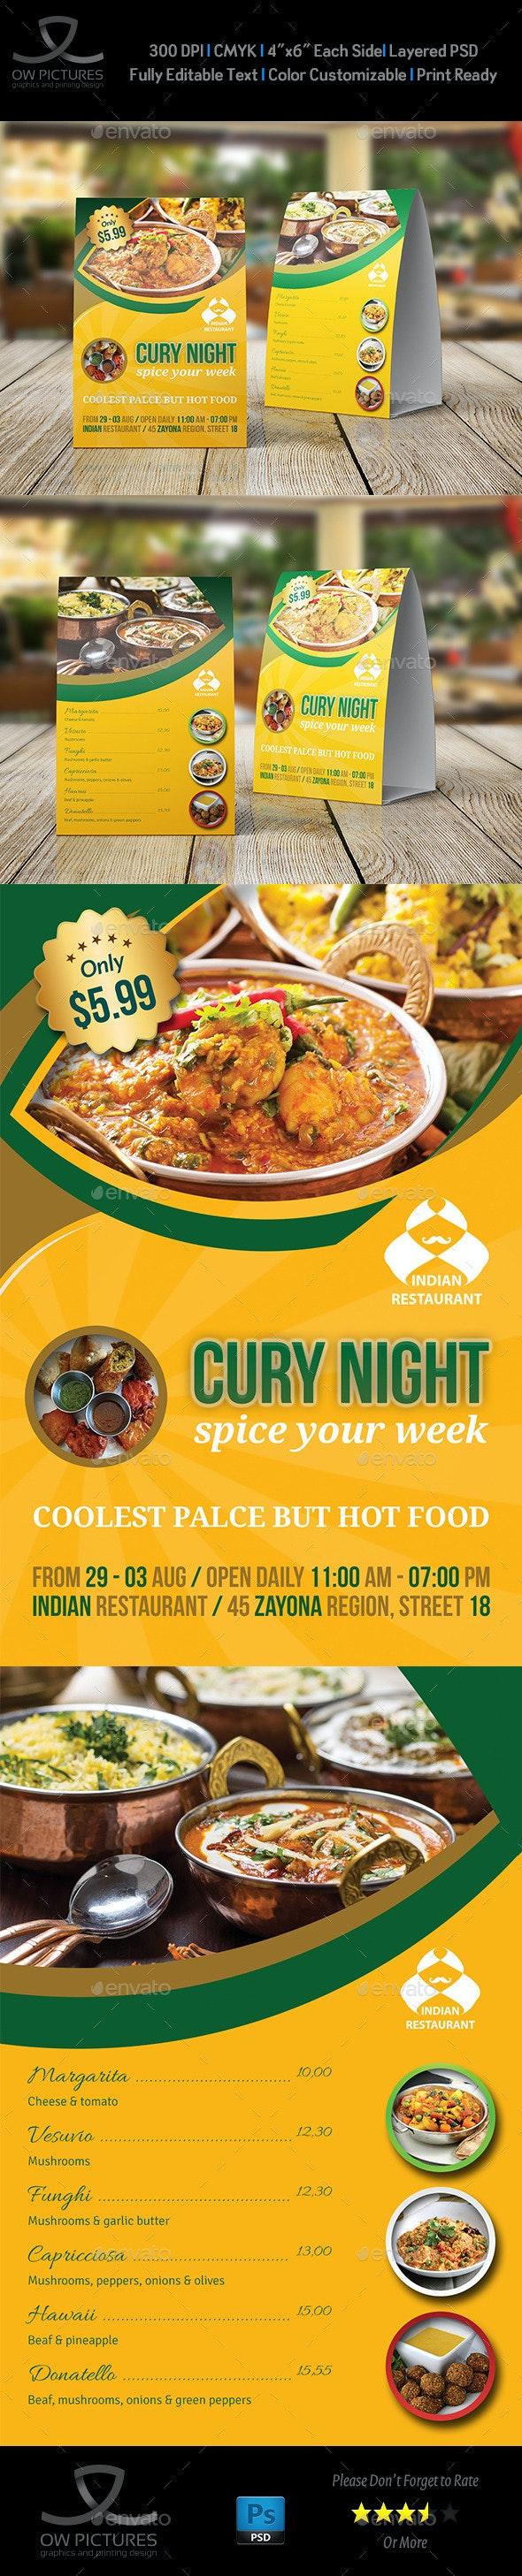 Indian Restaurant Table Tent Template - Food Menus Print Templates